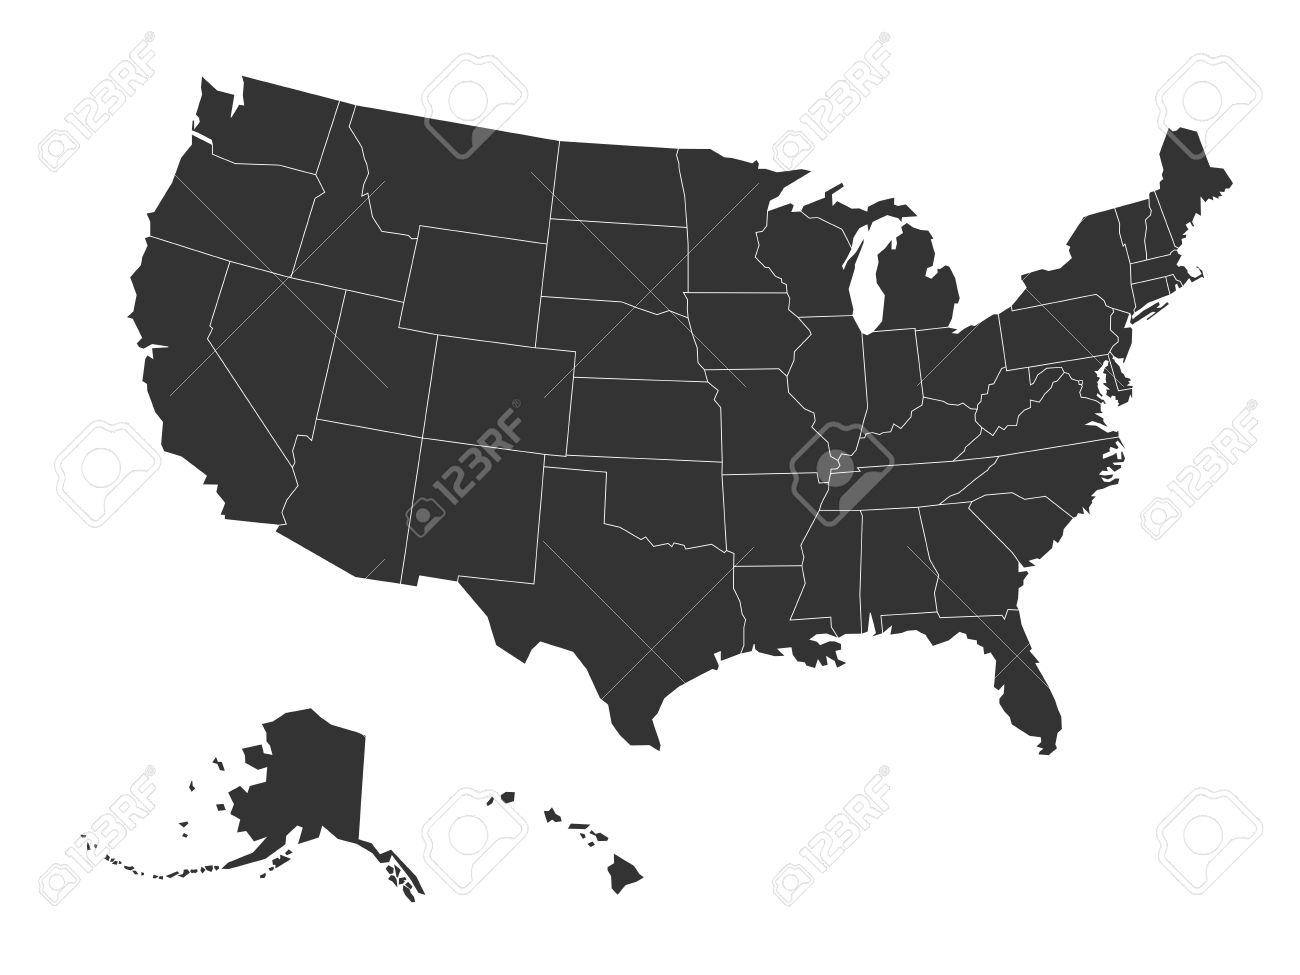 Blank Map Of United States Of America Simplified Dark Grey